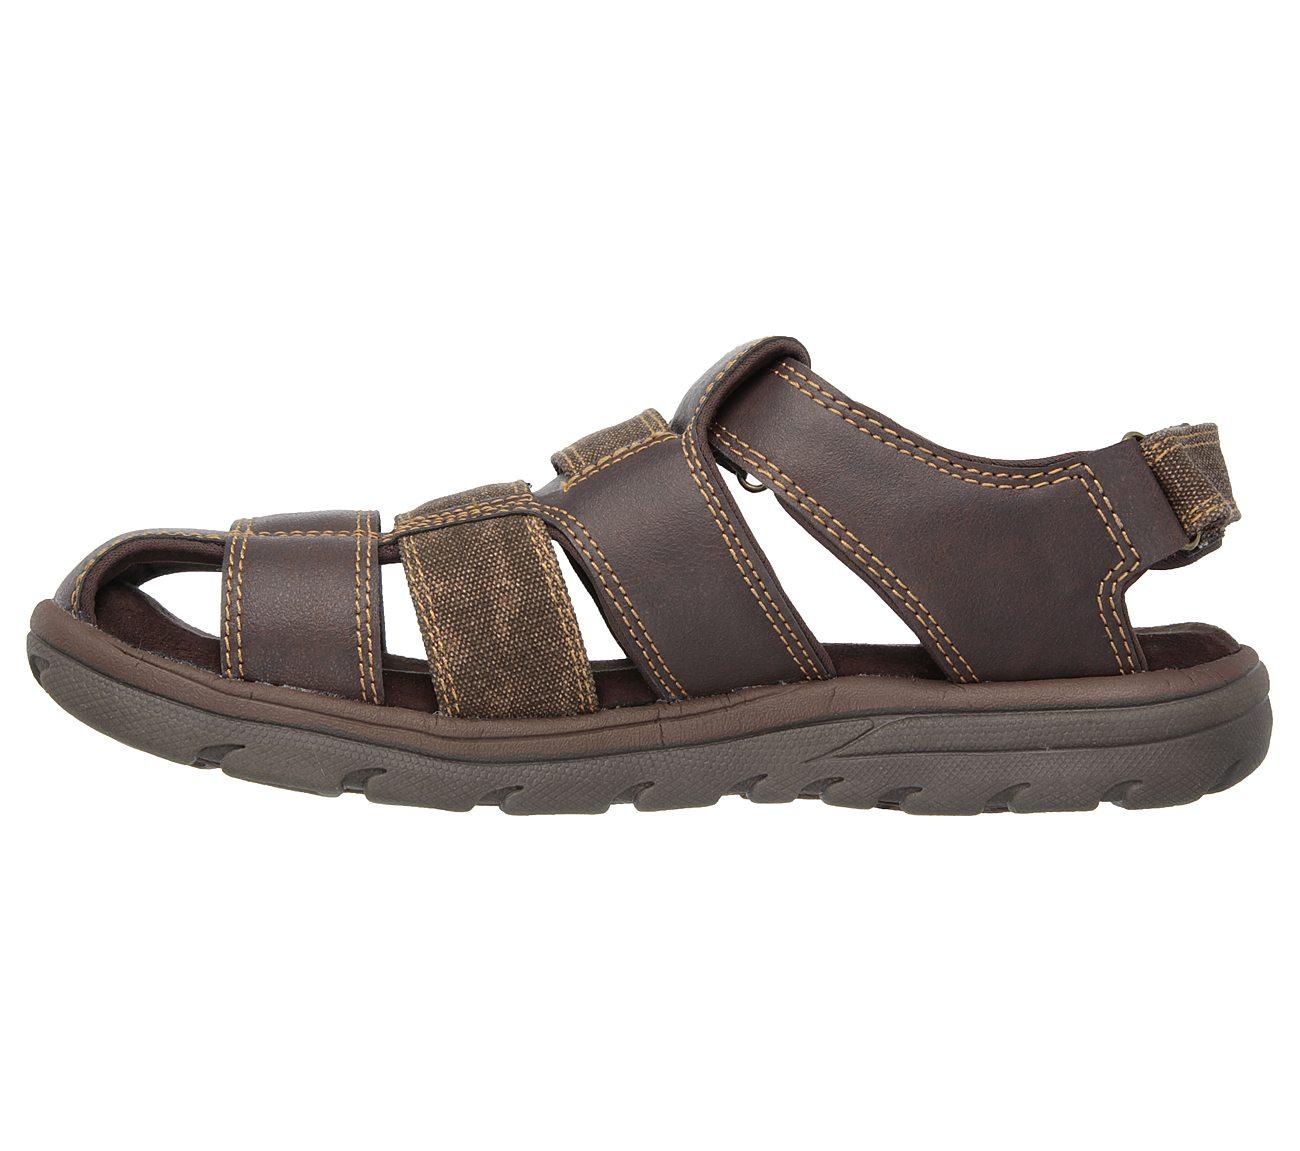 skechers fisherman sandals mens Sale,up